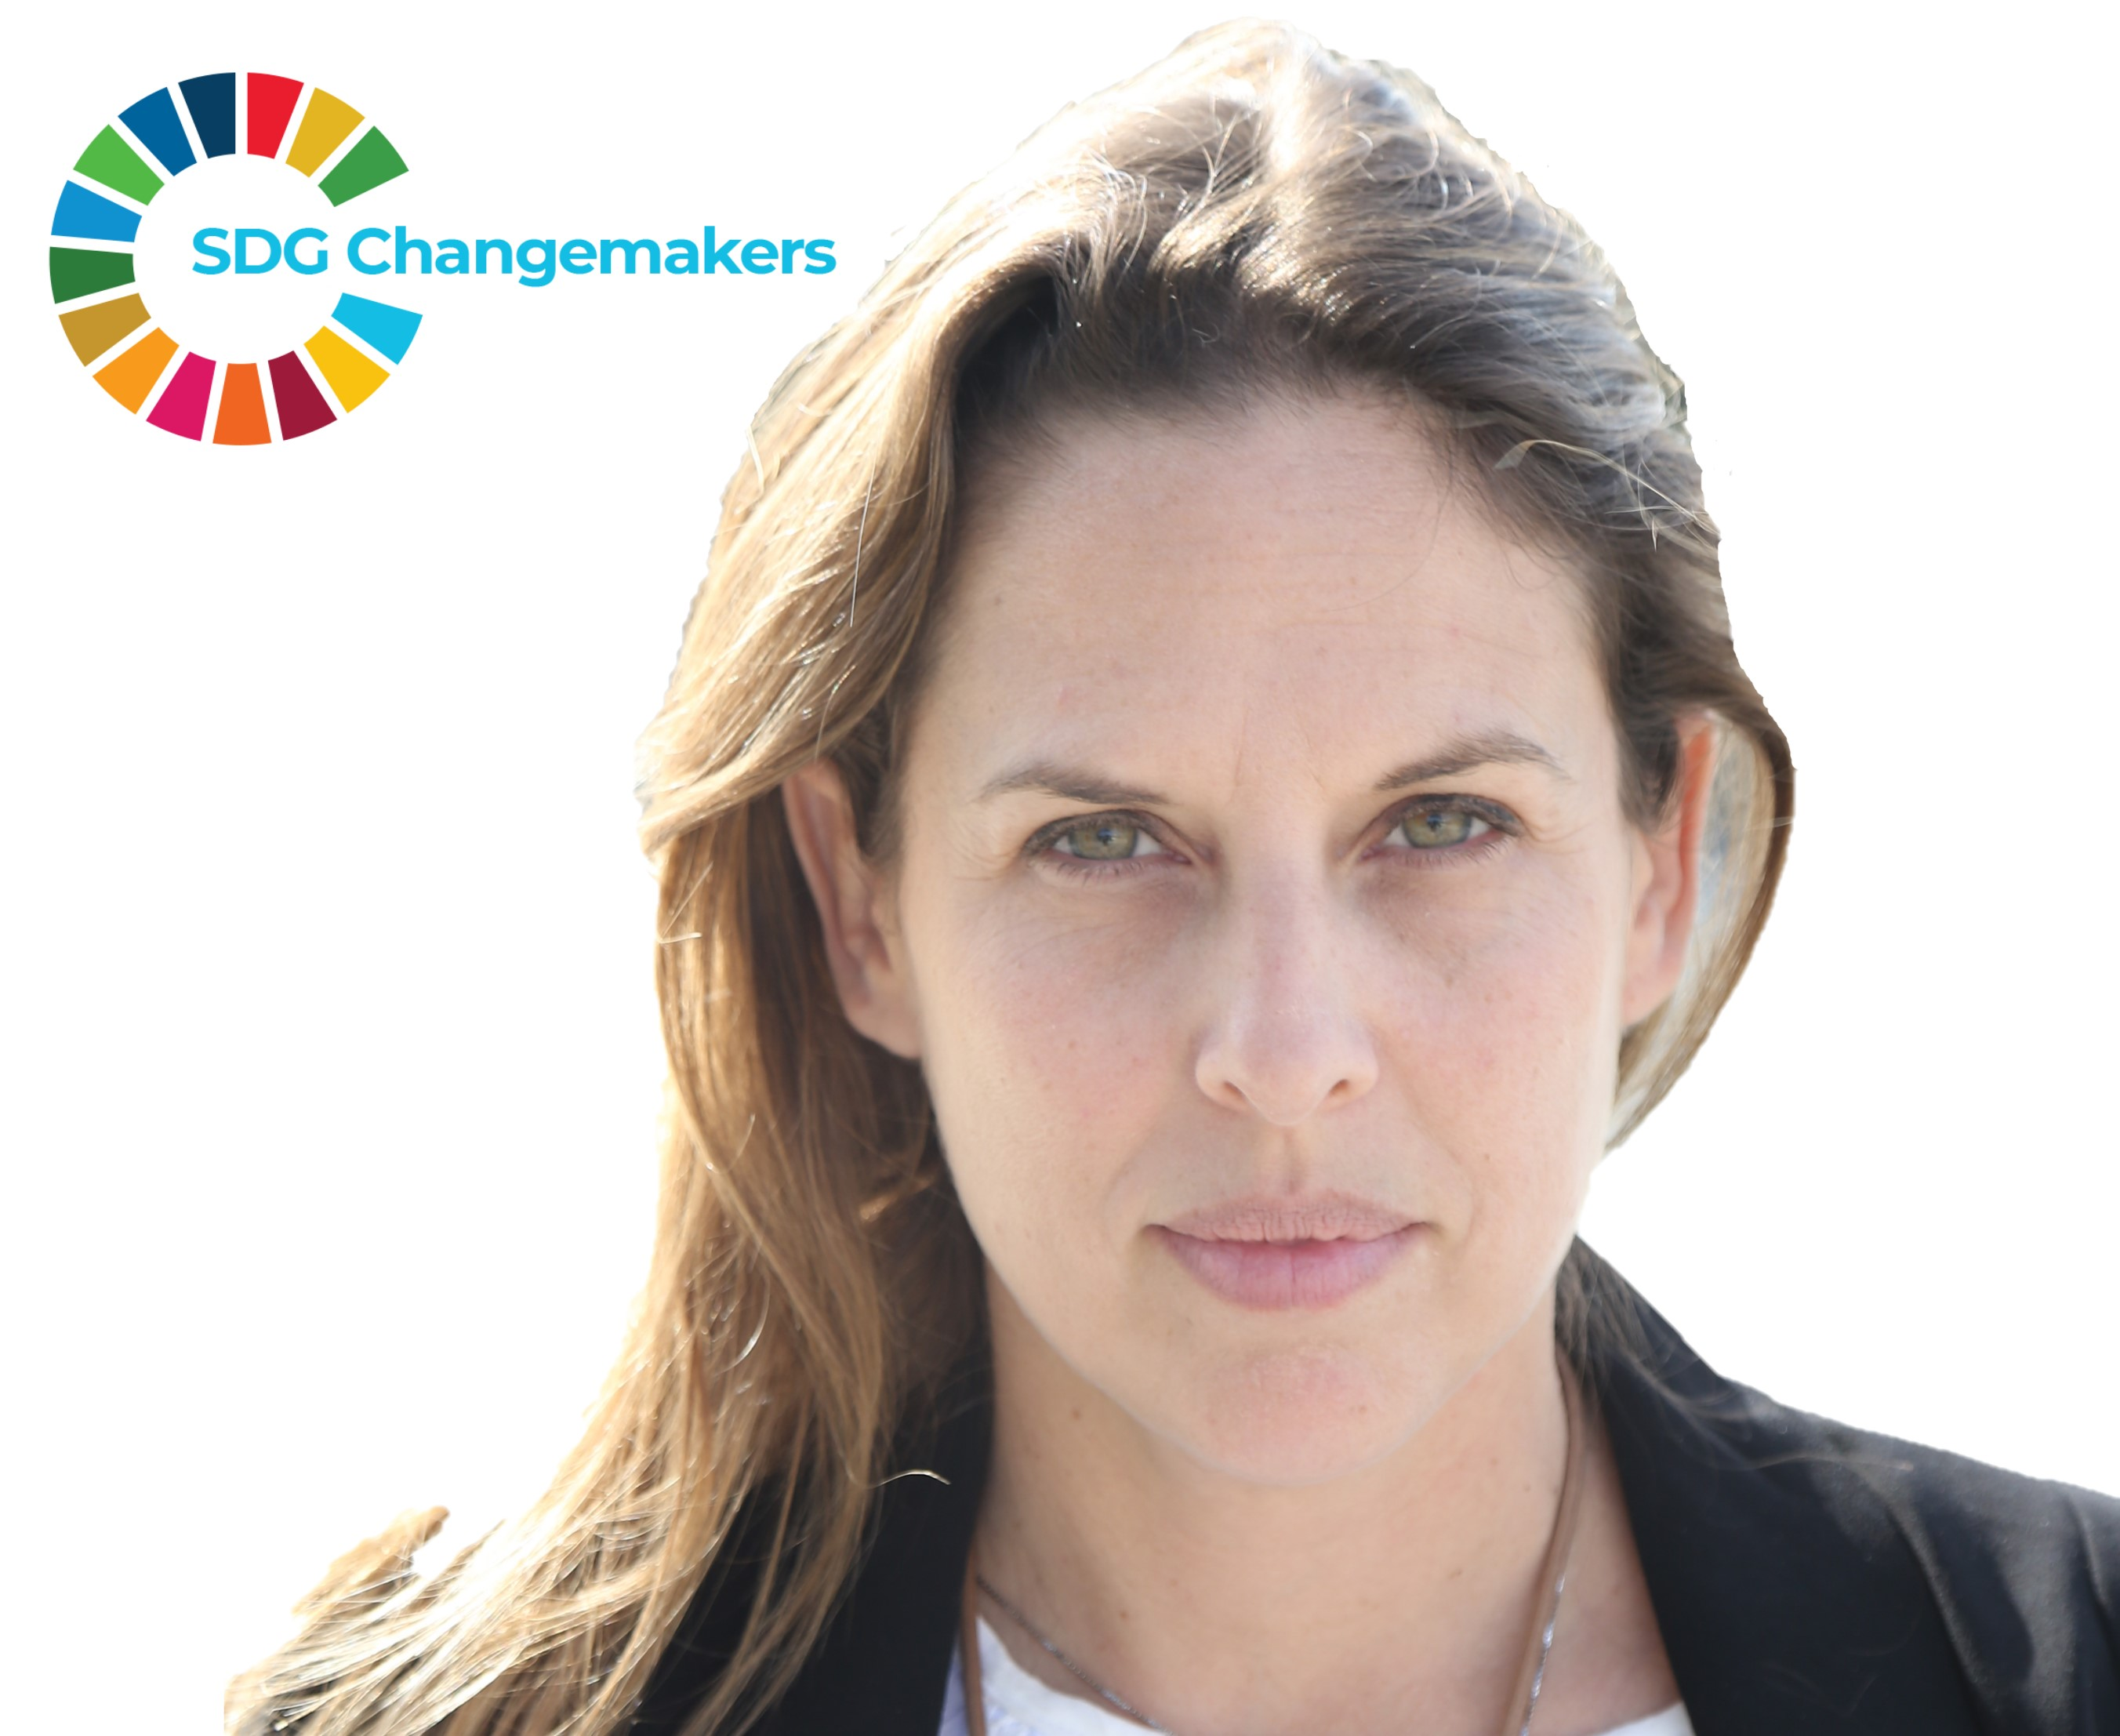 Shai-Lee Spigelman - Changemaker - Social Impact Israel